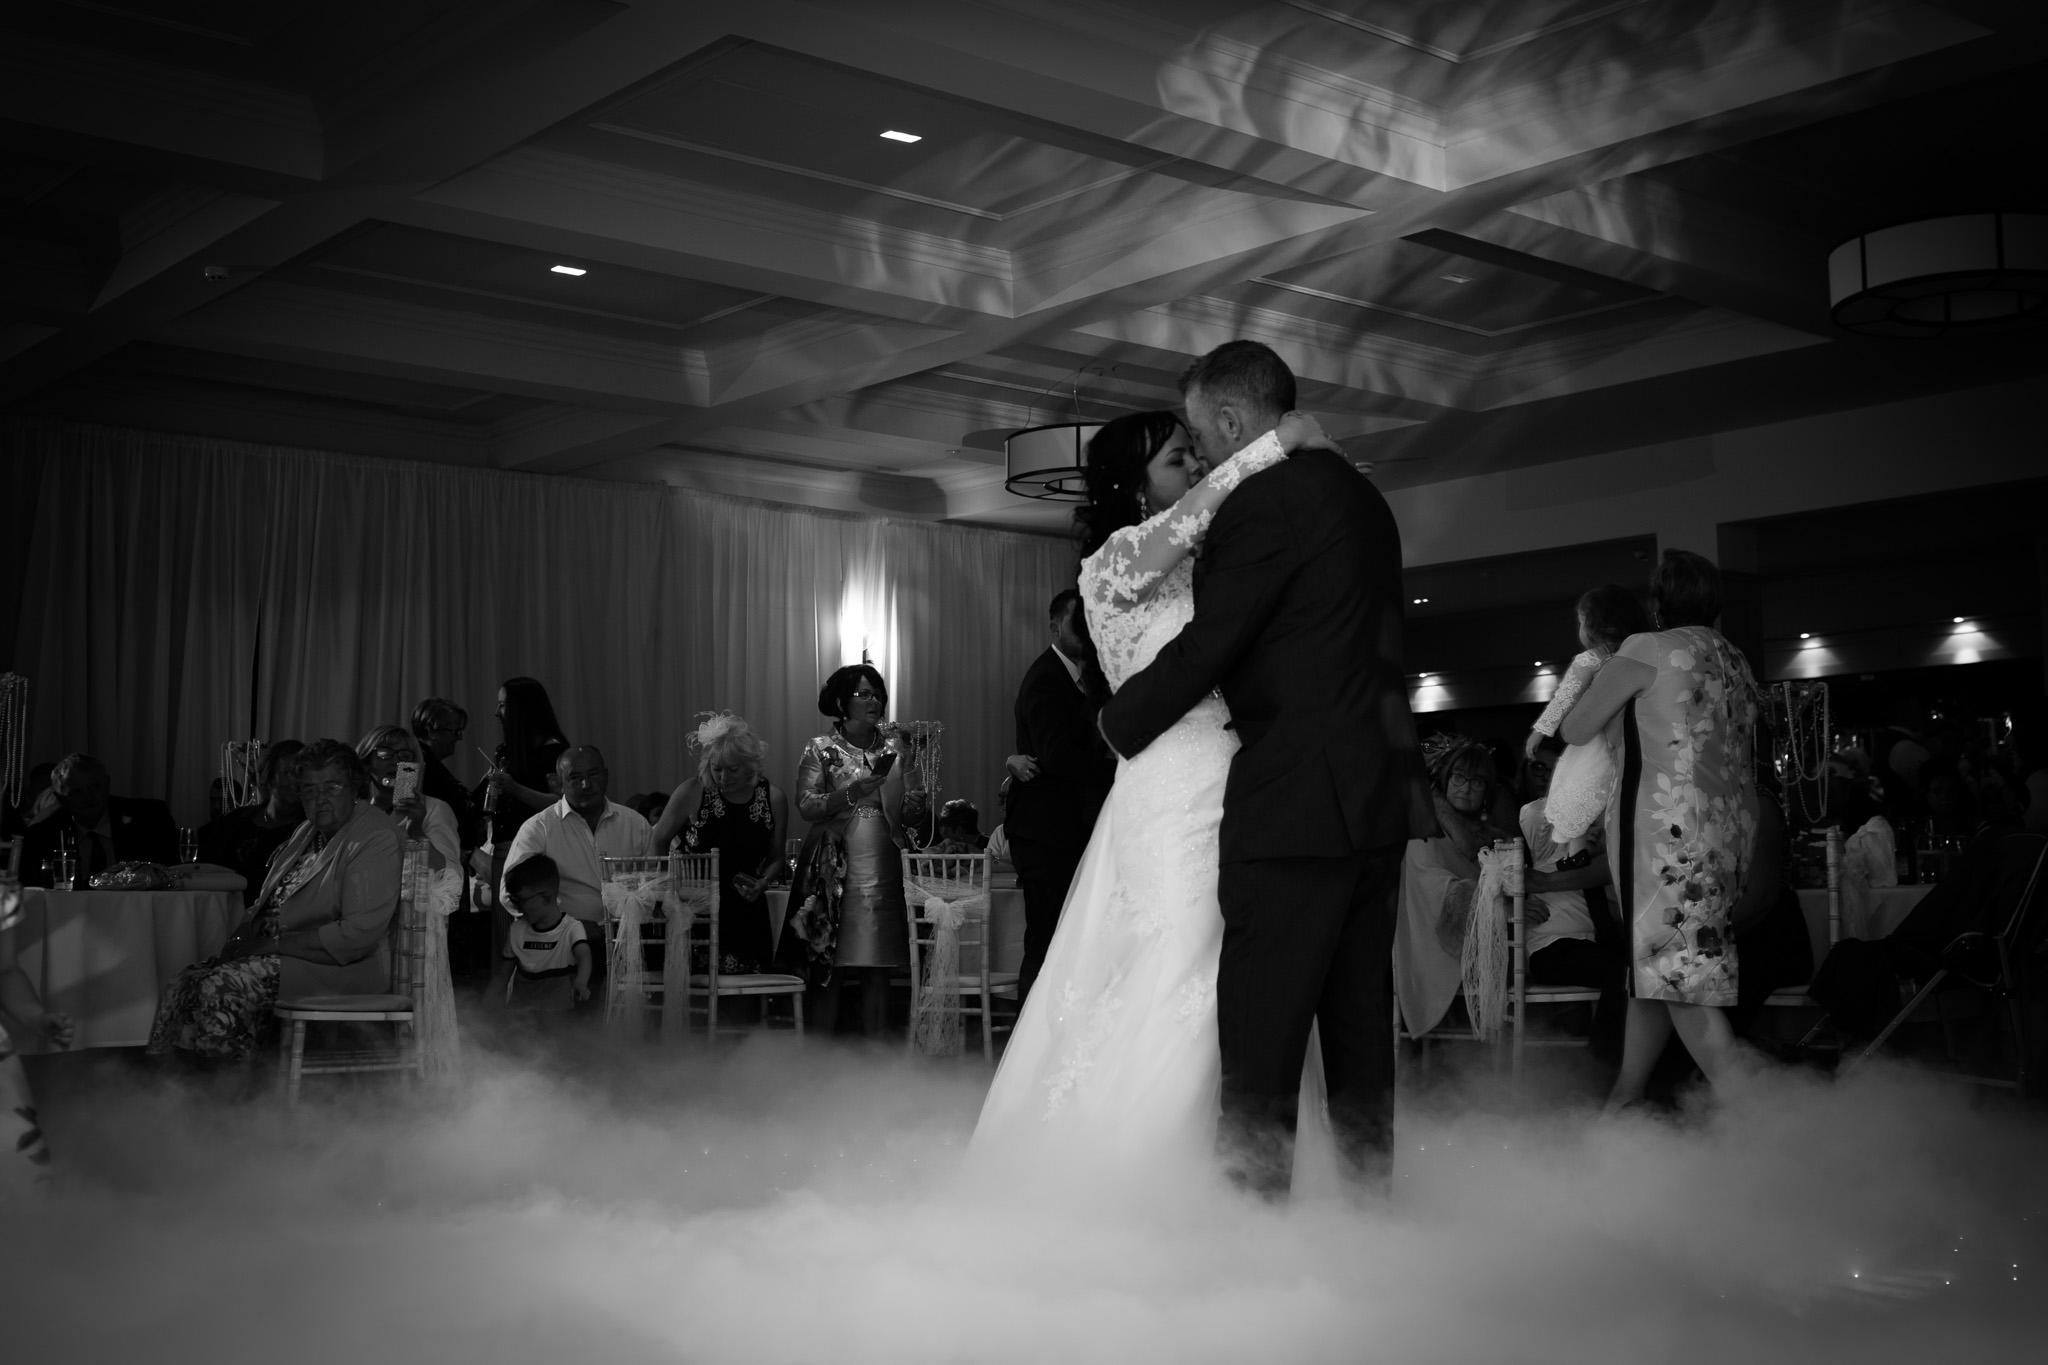 Mark_Barnes_Northern_Ireland_Wedding_Photography_Marine_hotel_ballycastle_Wedding_Photography_Janet&Darren-40.jpg